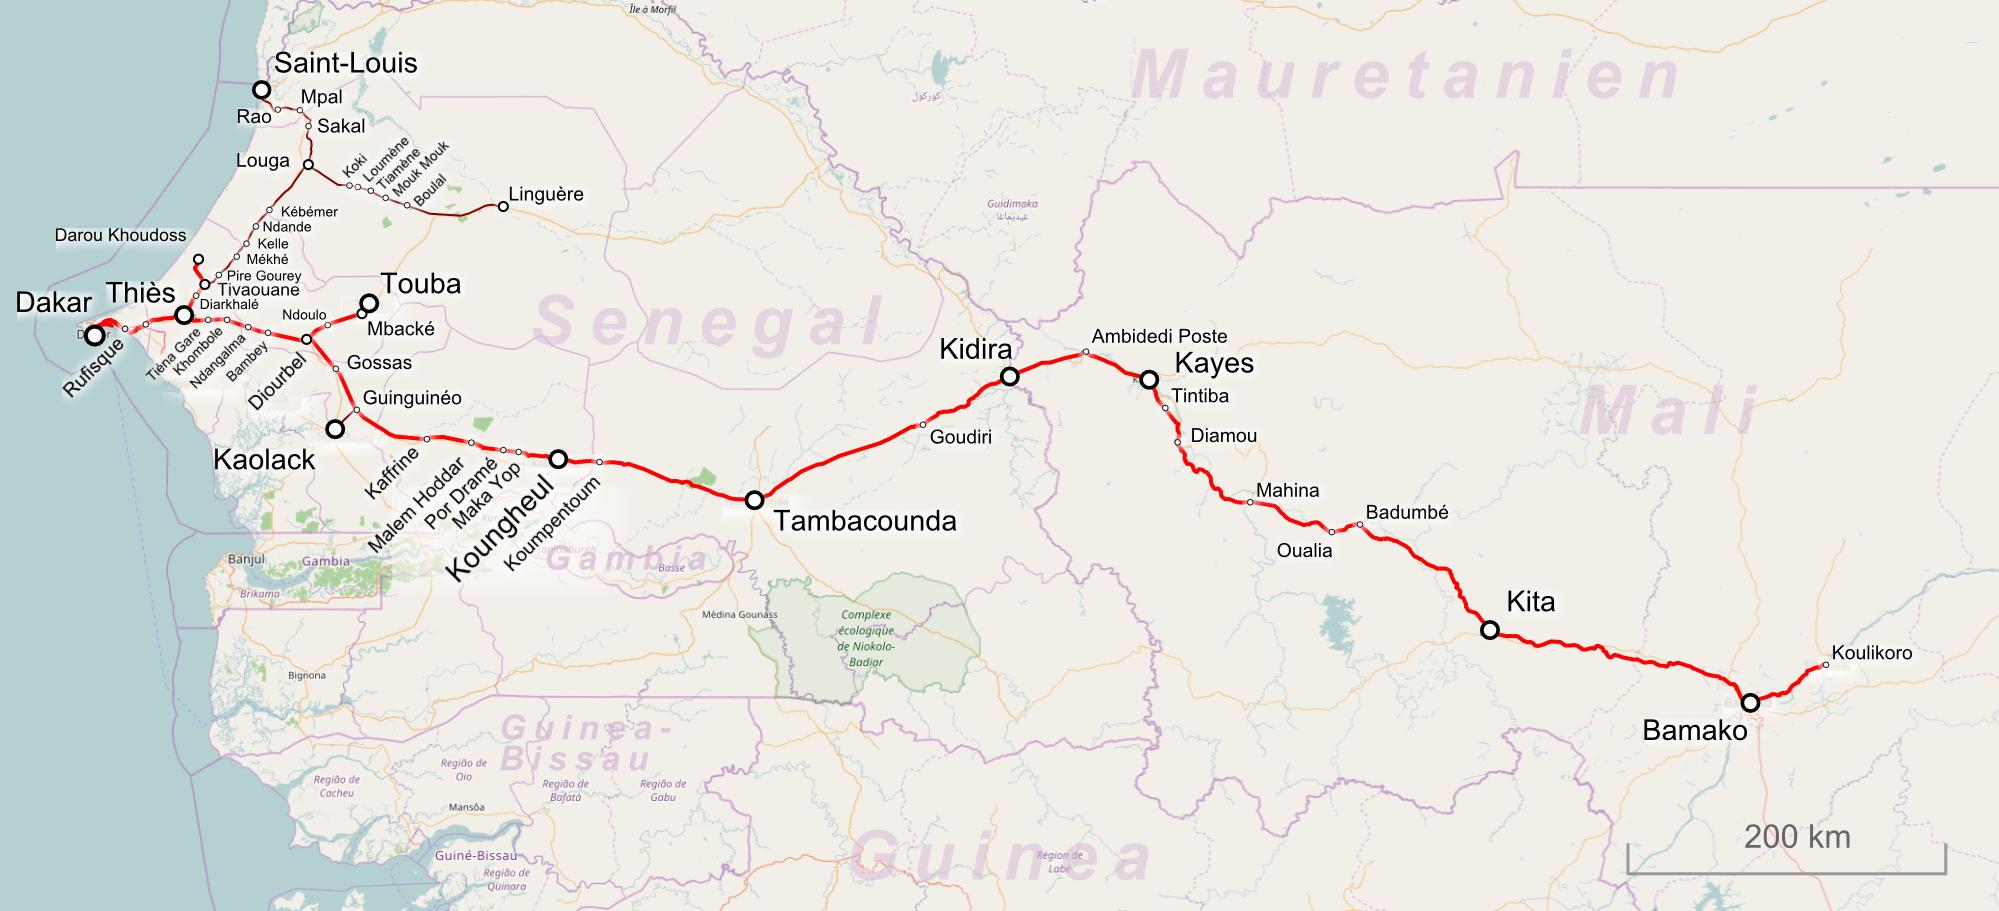 Dakar–Niger Railway - Wikipedia on paris-dakar route map, rally usa map, 2014 dakar rally raid map, rallye de dakar map, dakar world maps, dakar on facebook, dakar africa, dakar map island, songhai tribes map,